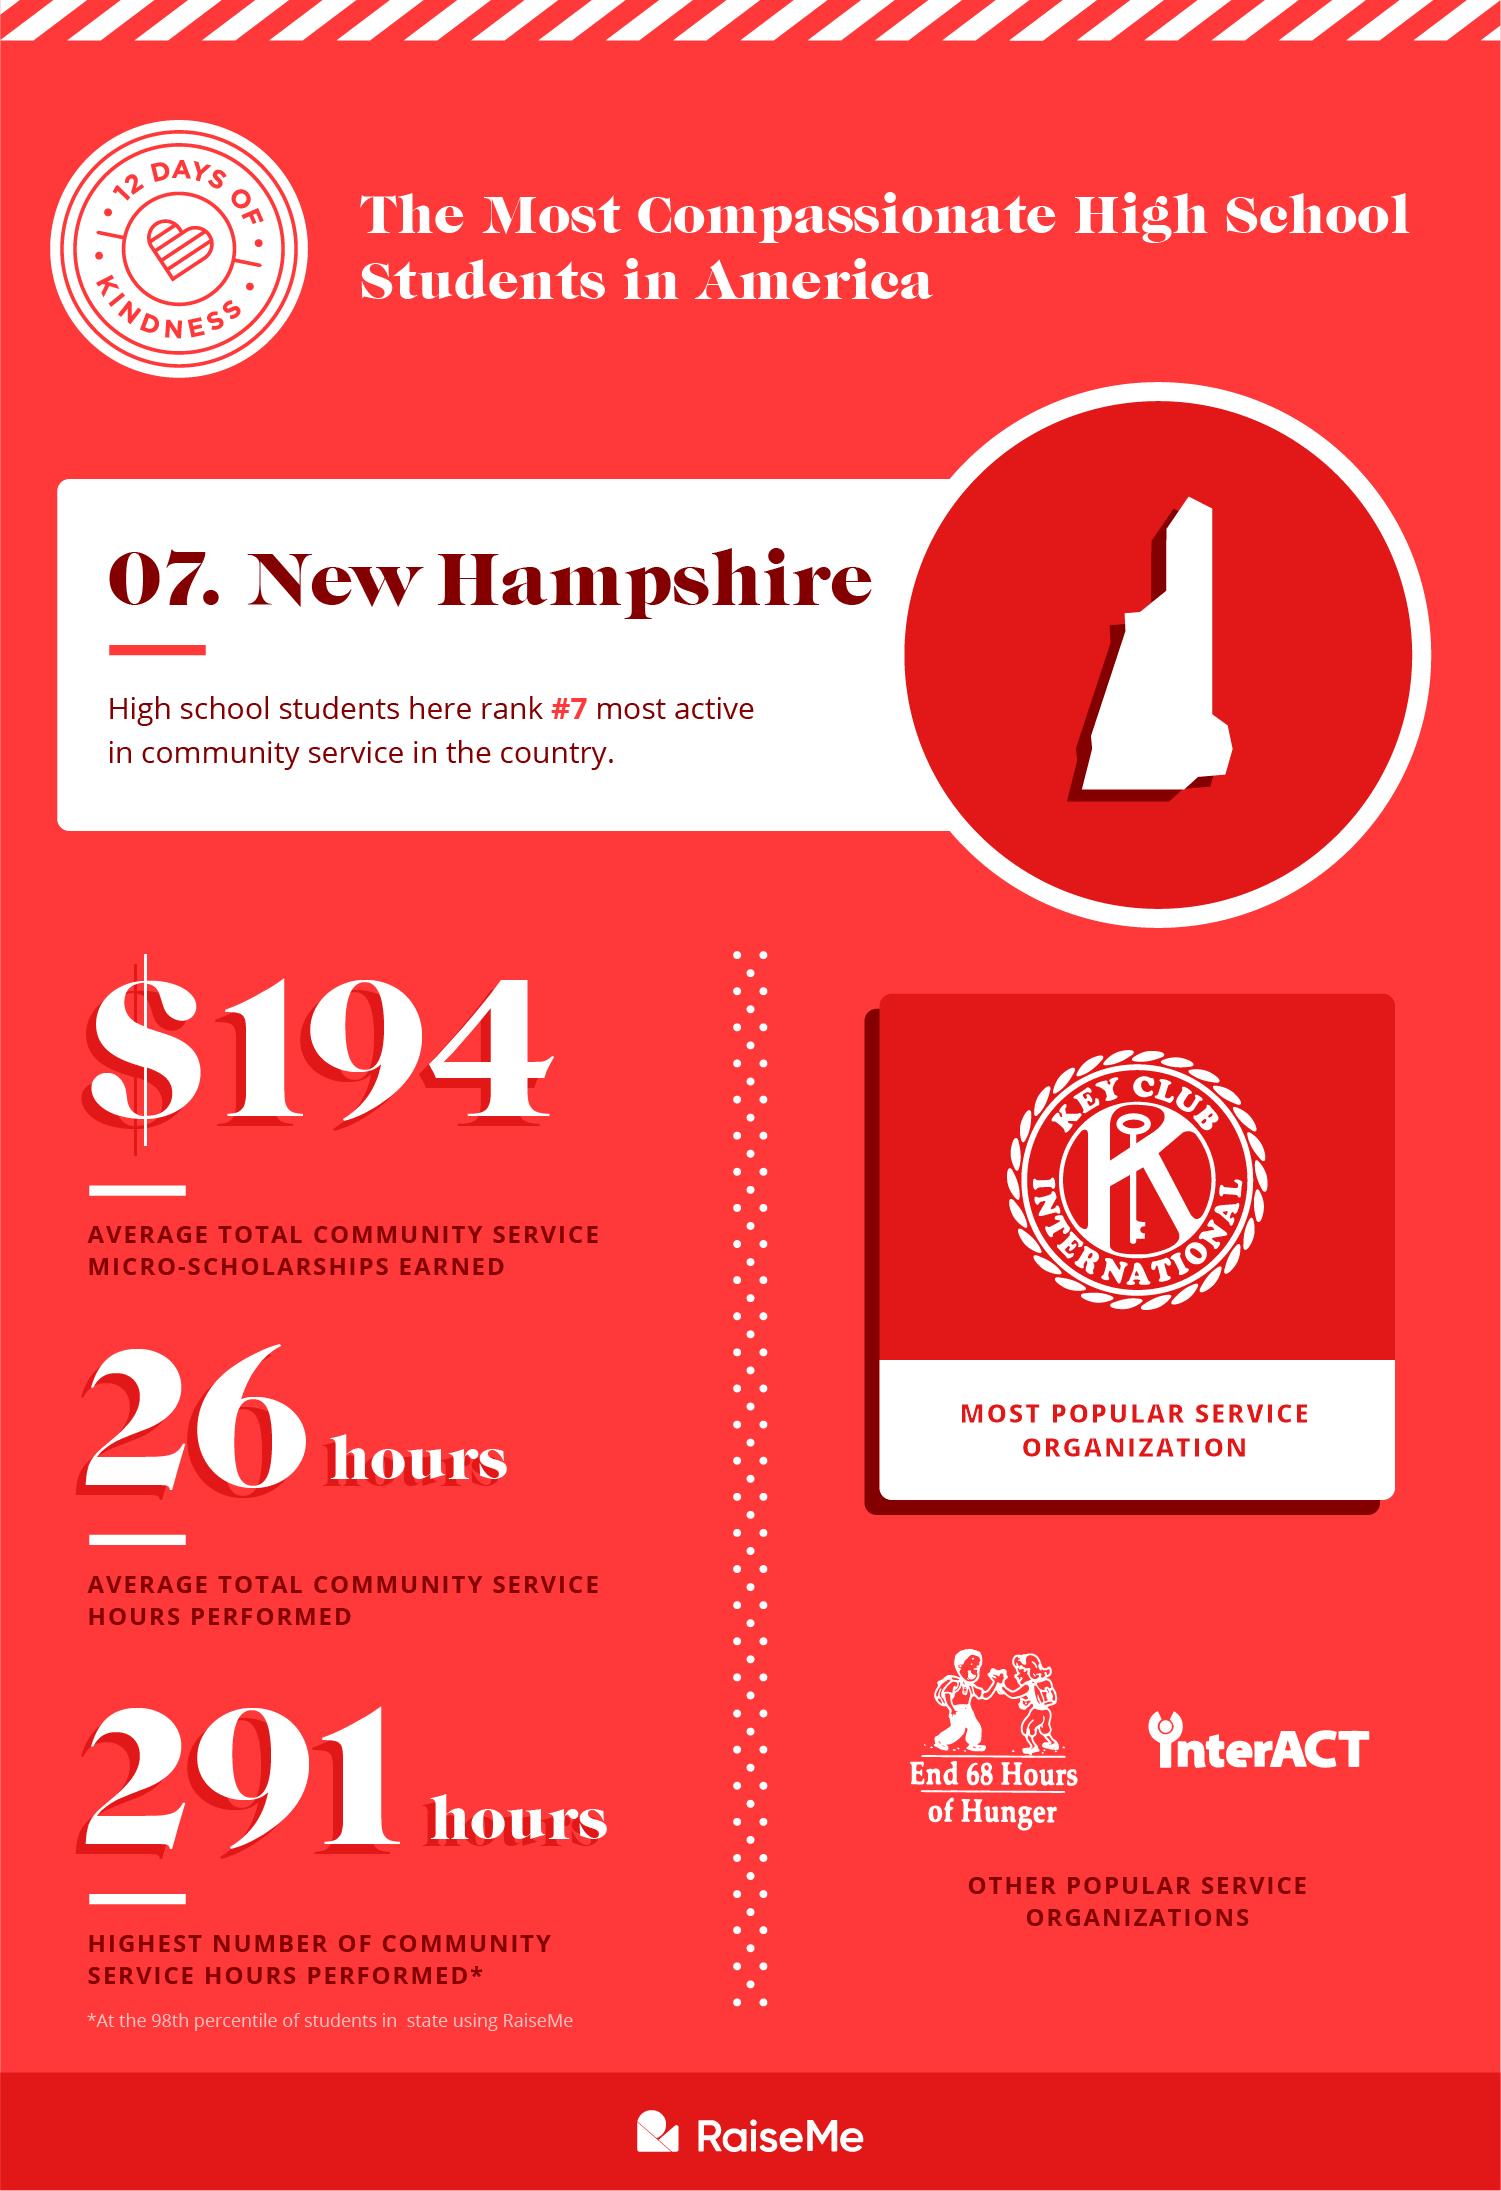 #7 New Hampshire